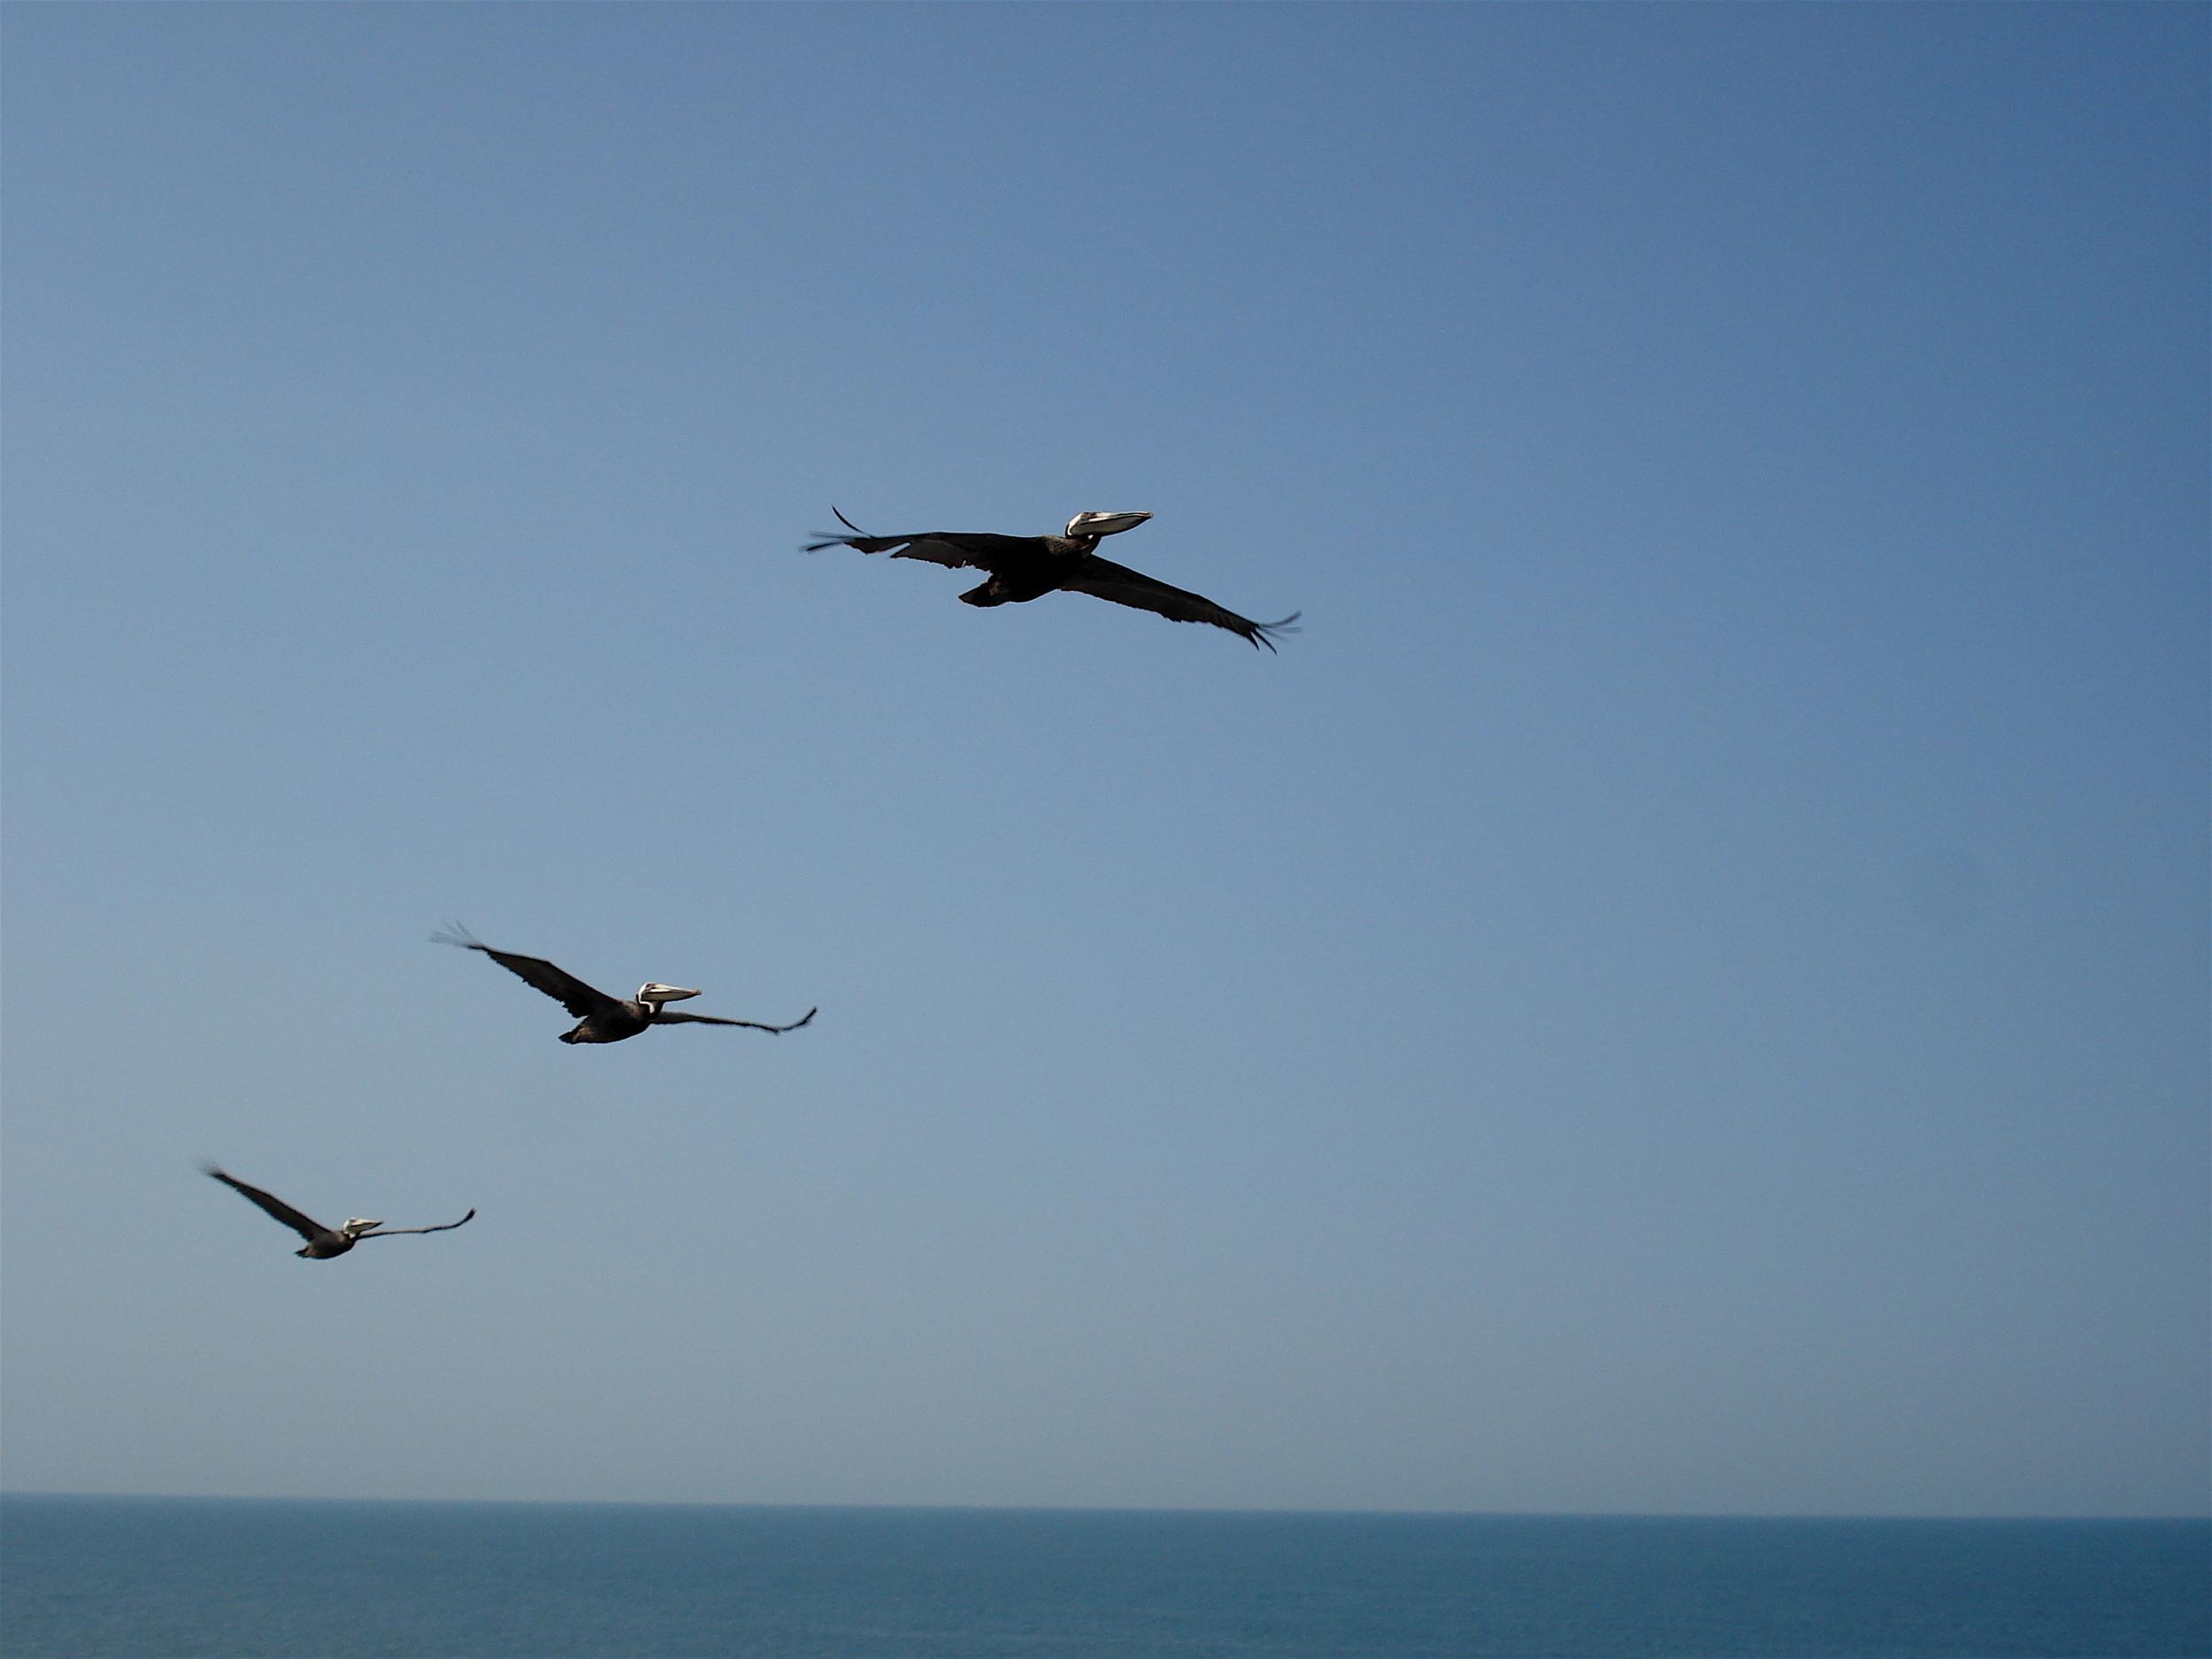 Pelicans in flight at Daytona Beach, Florida